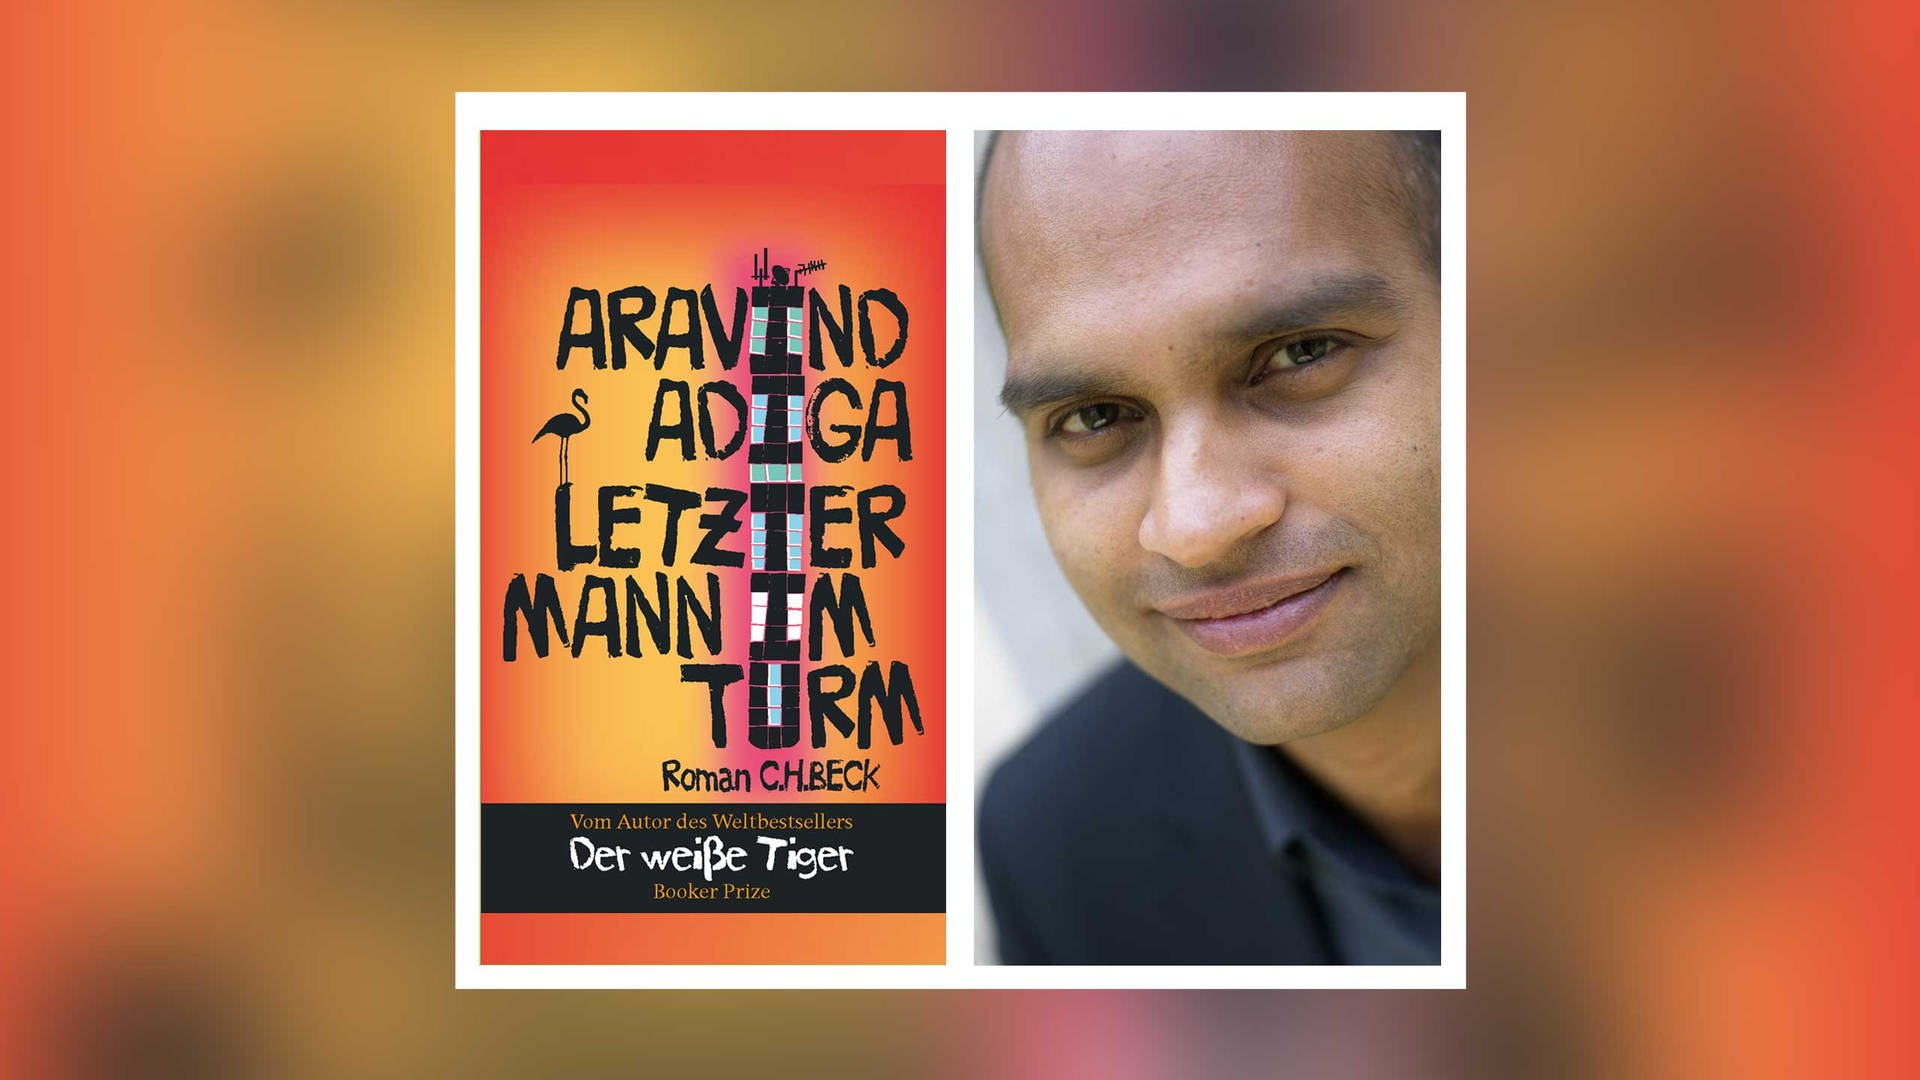 Adiga Aravind - Letzter Mann im Turm (5/21)